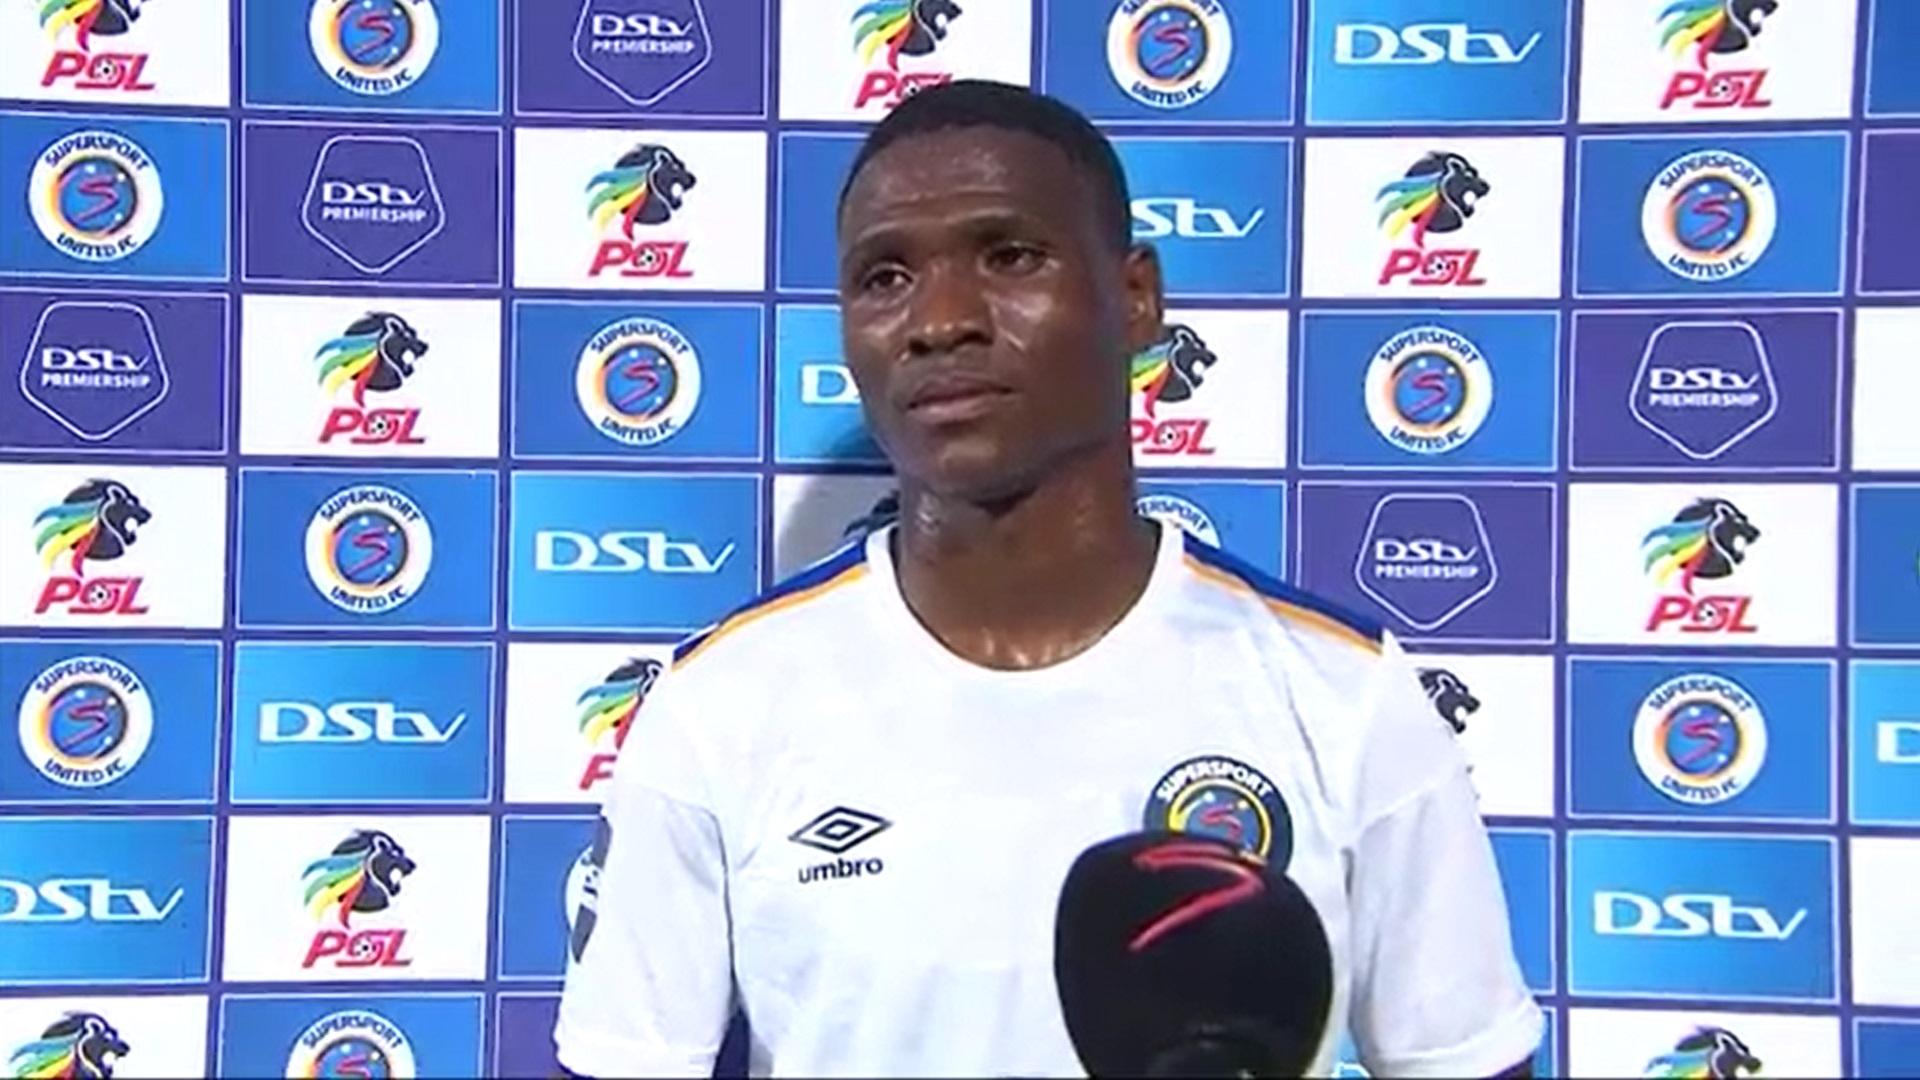 DStv Premiership | SuperSport United v Maritzburg United | Post-match interview with Thatayaone Ditlhokwe